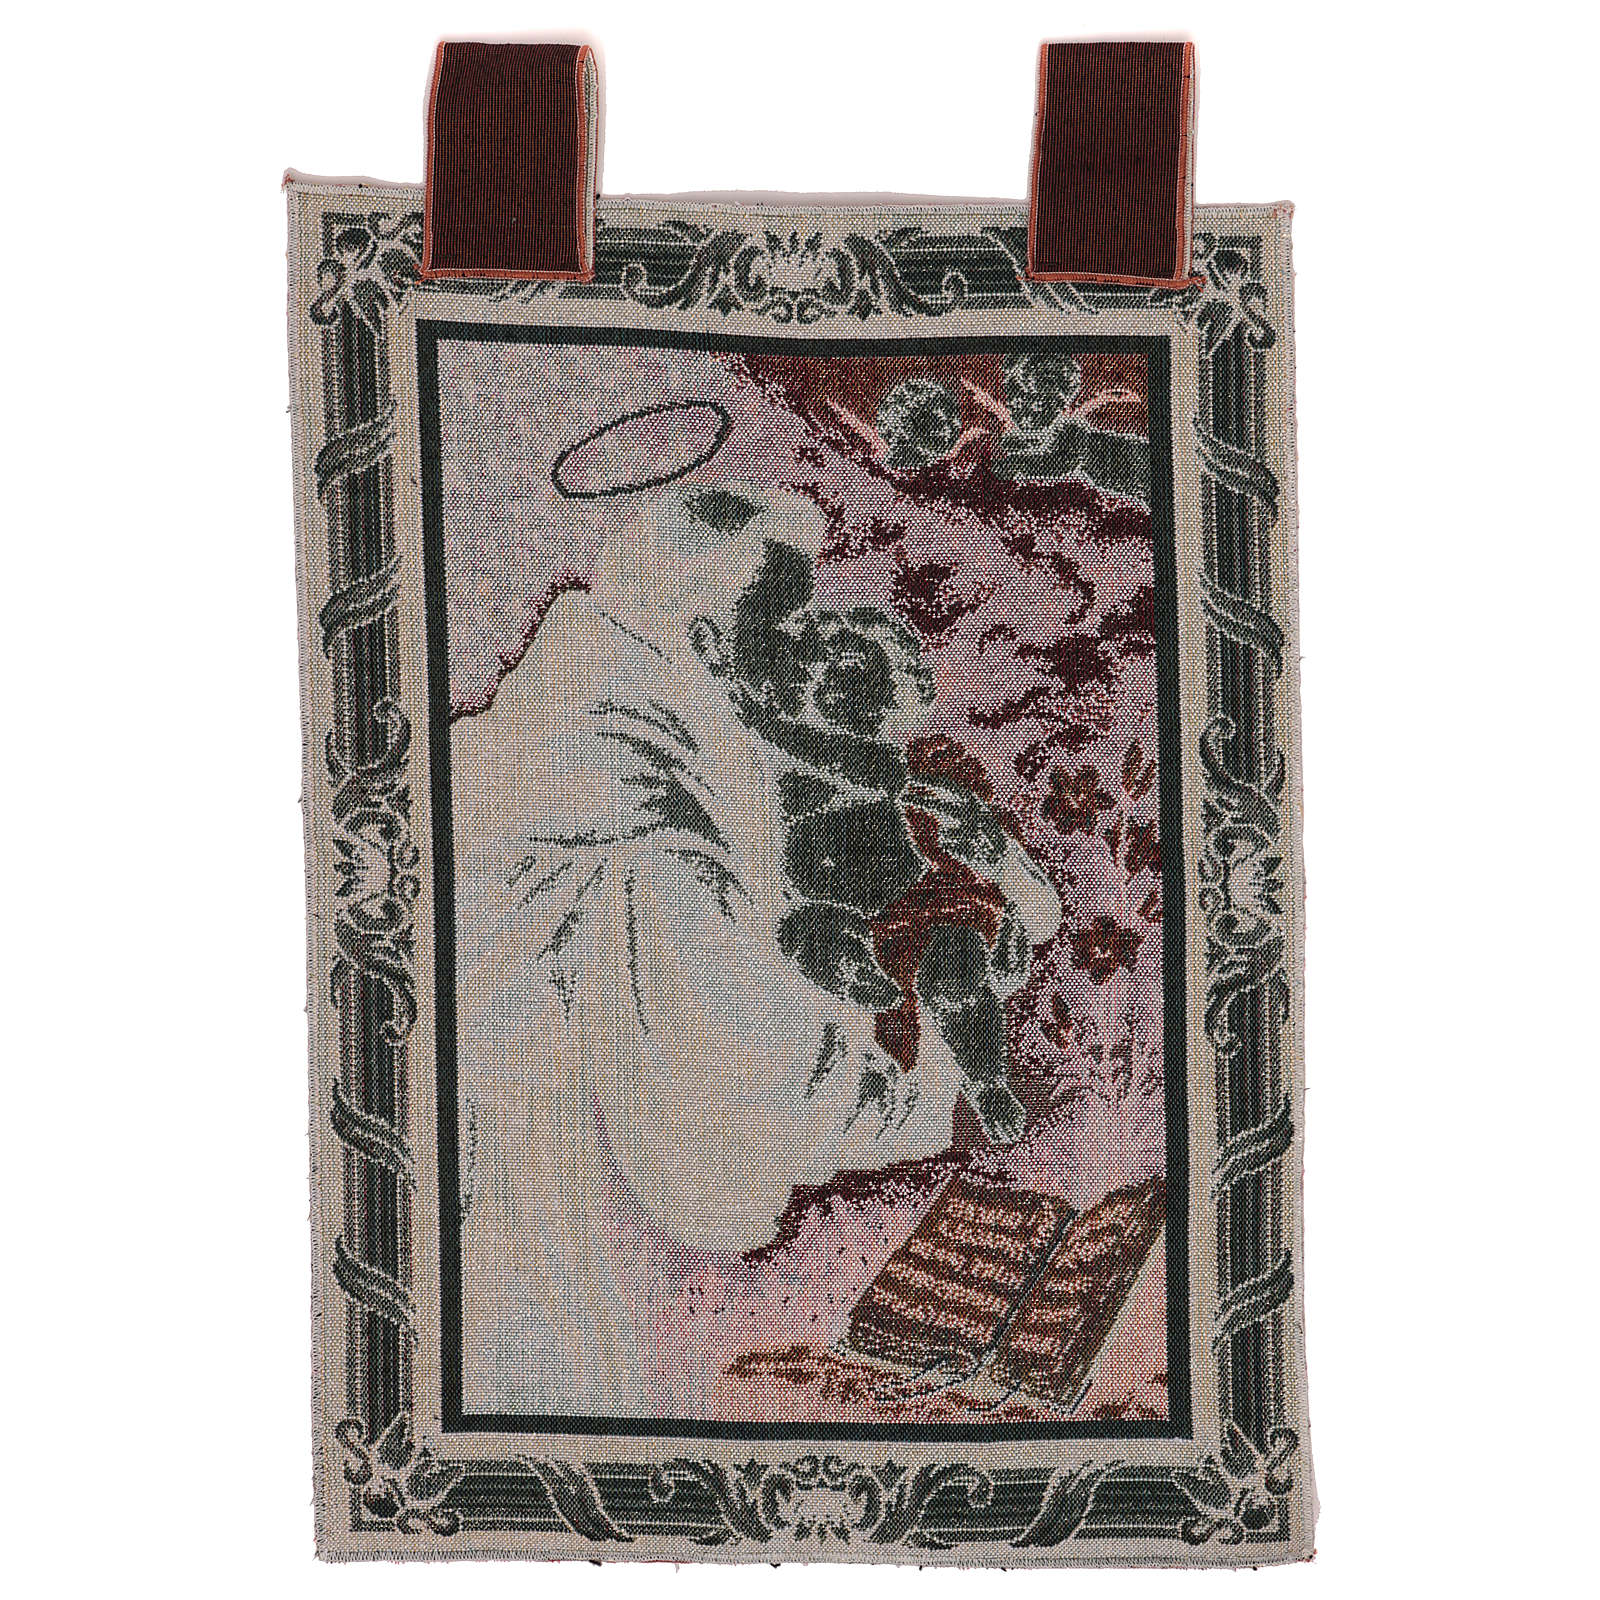 Tapiz S. Antonio de Padua Libro marco ganchos 50x40 cm 3